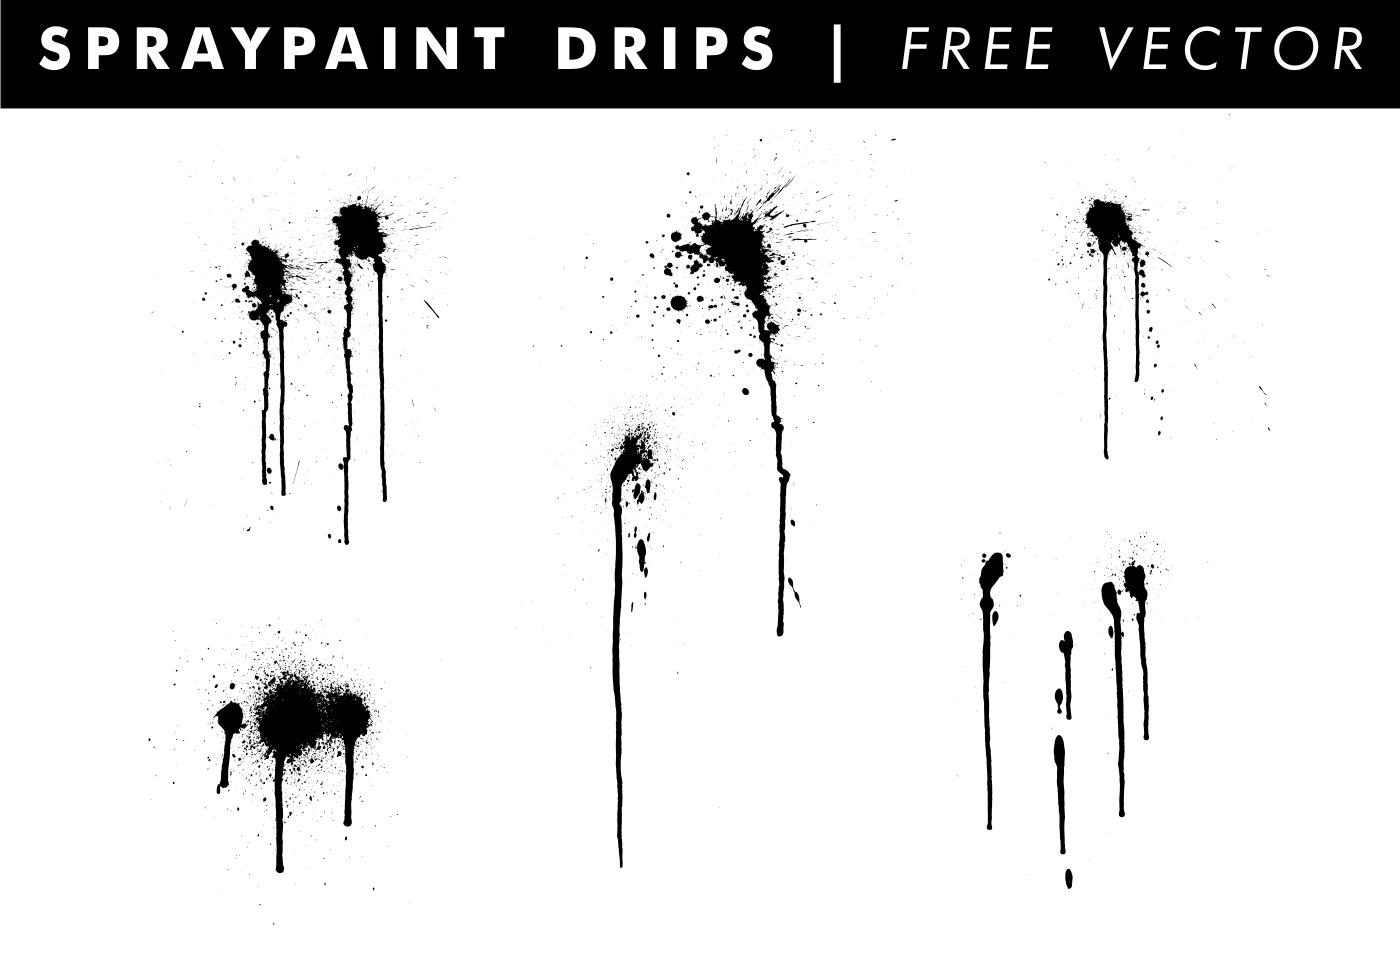 Drip Spray Paint Art